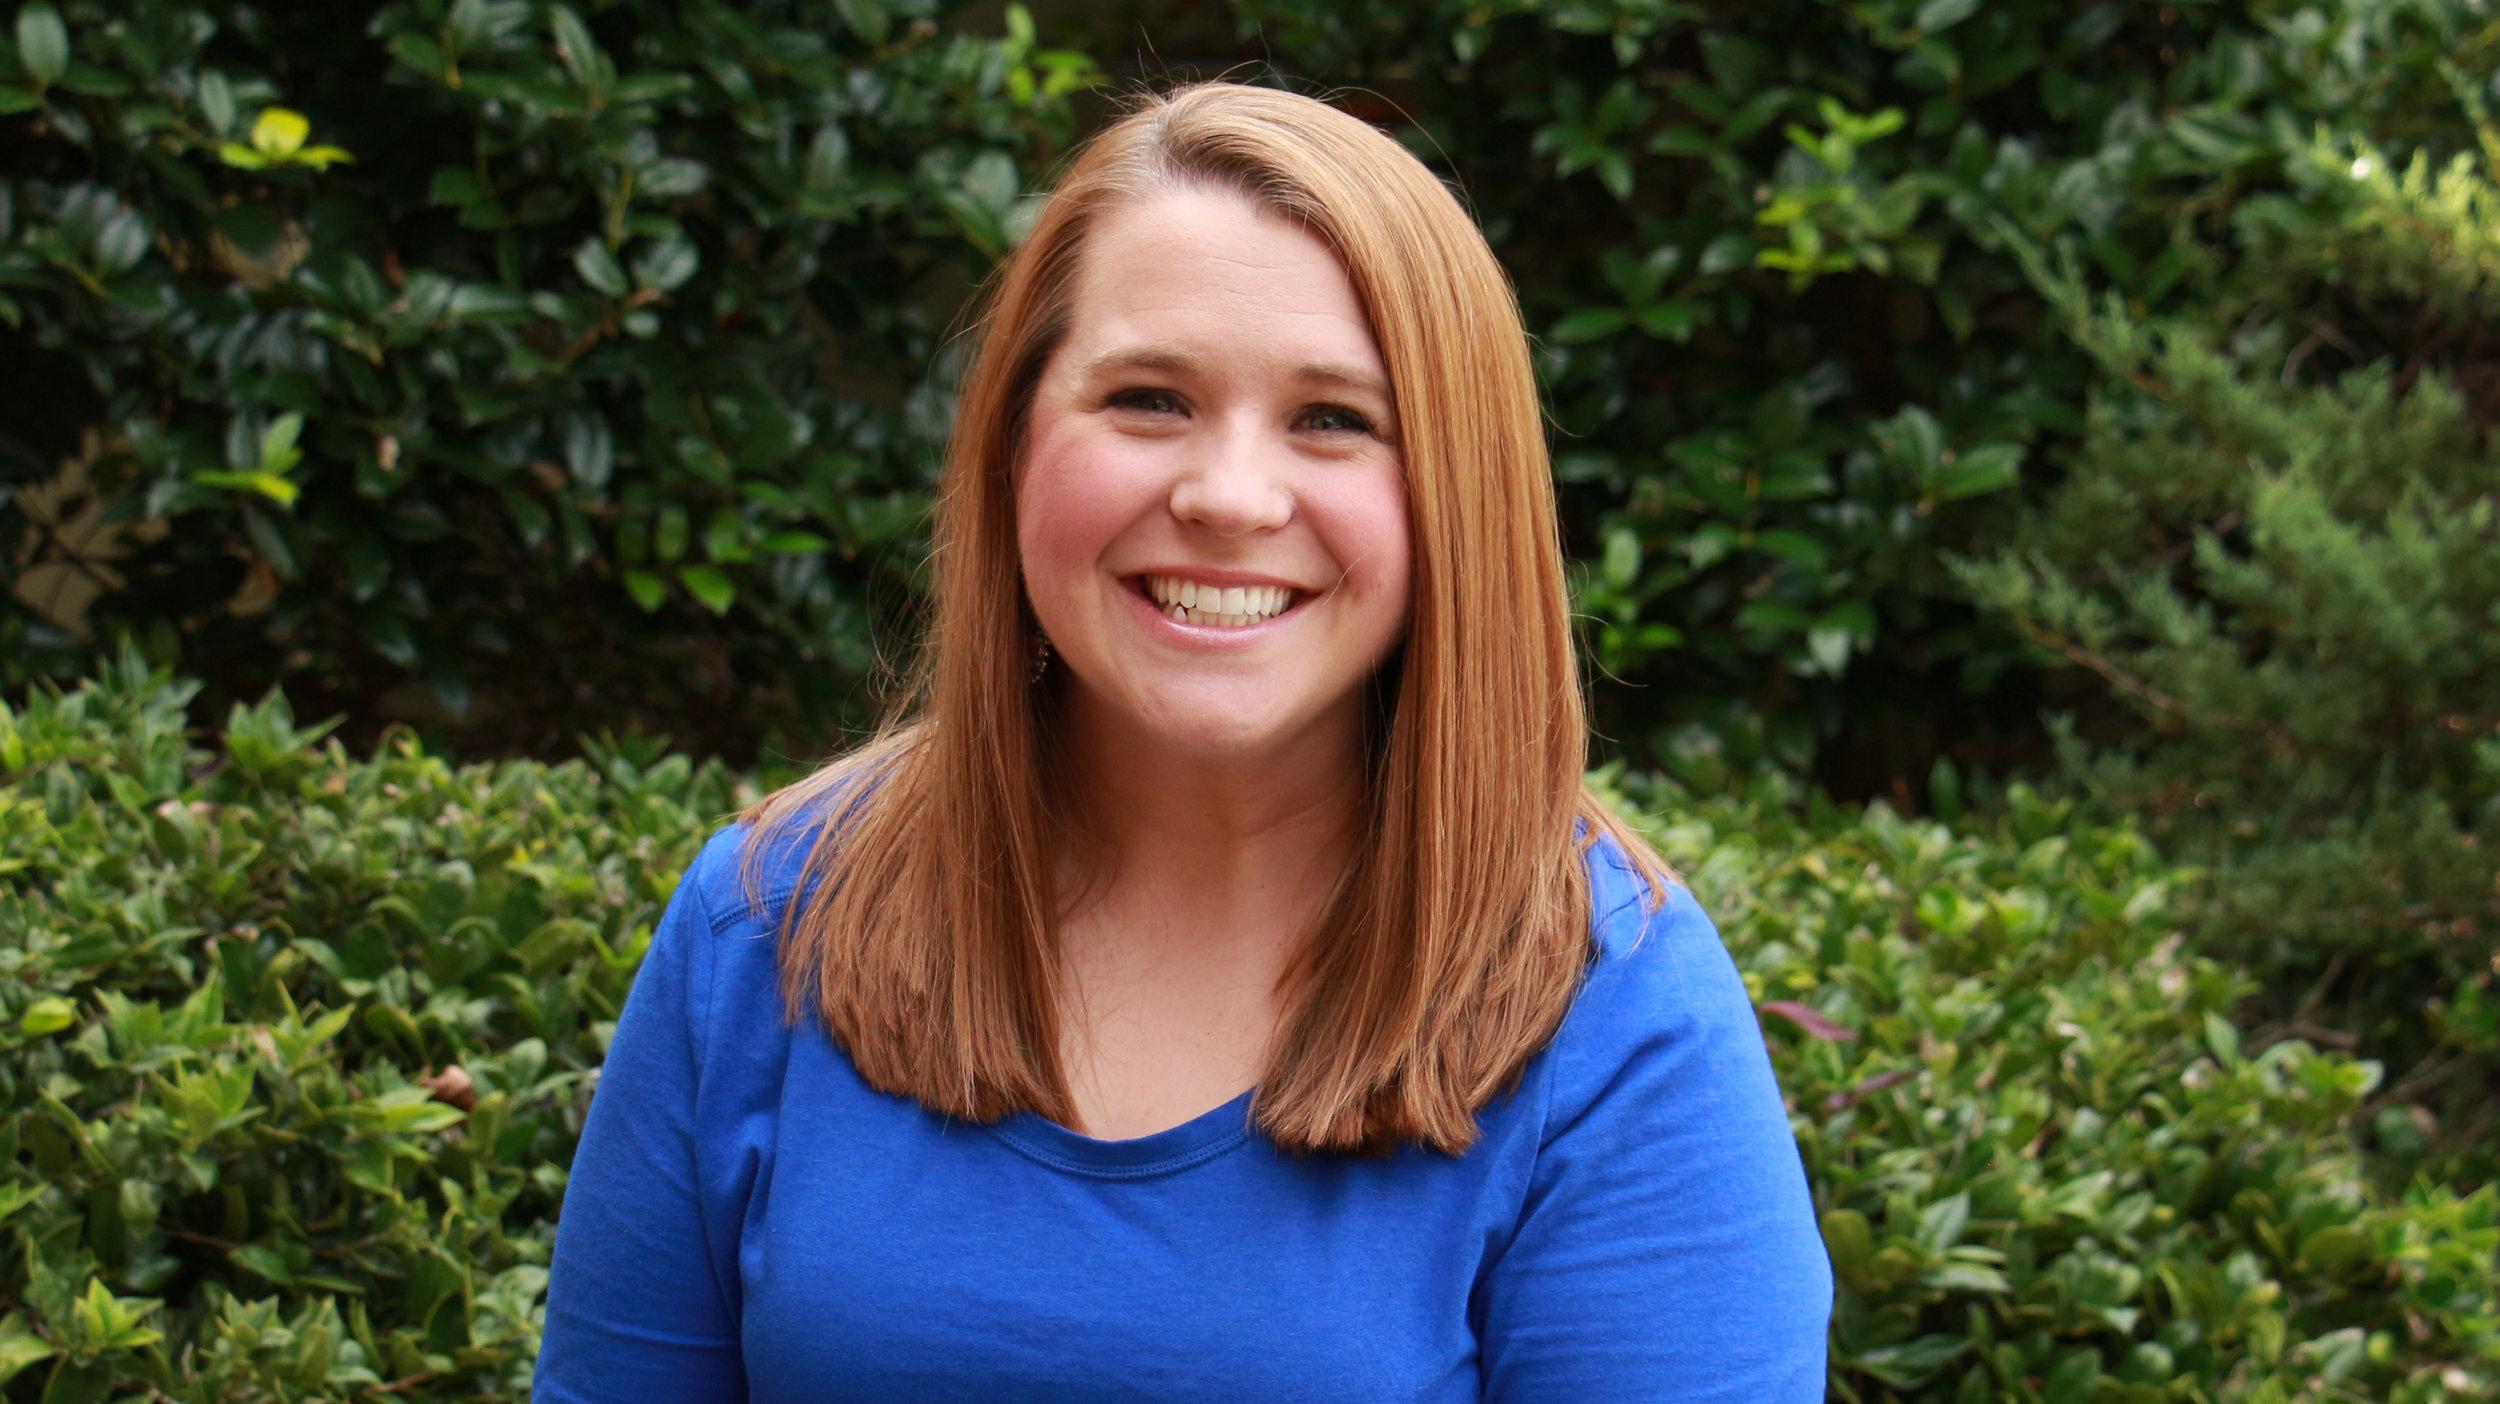 Melanie Reynolds, Babies' Coordinator